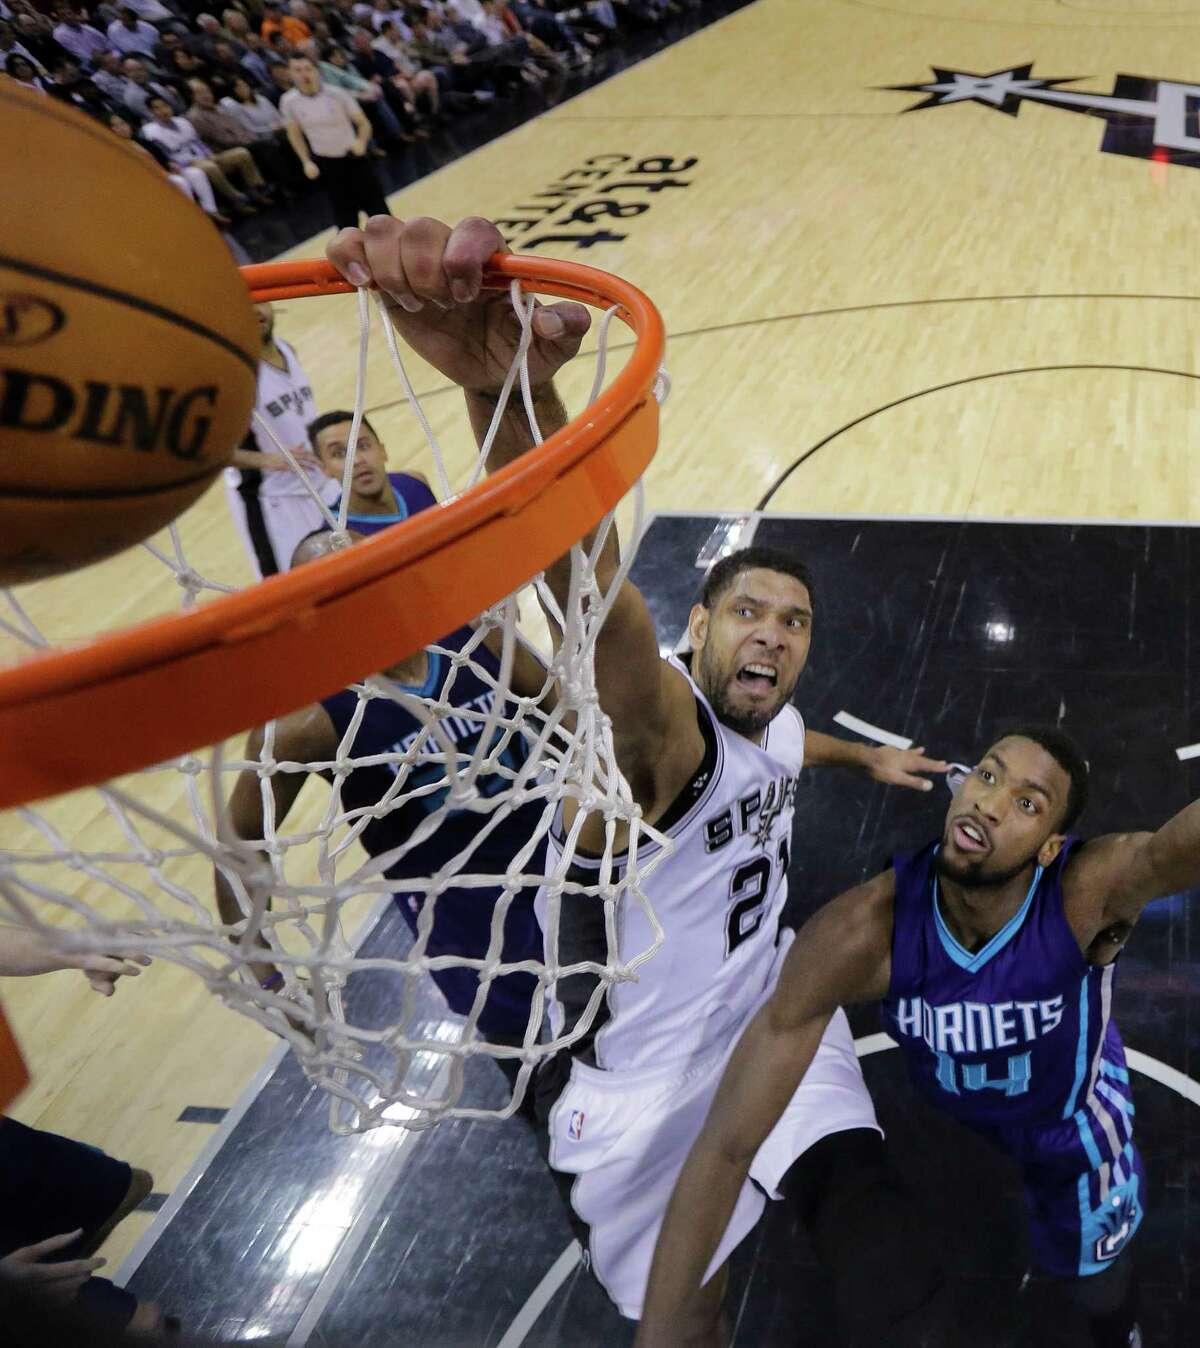 Spurs forward Tim Duncan dunks over the Charlotte Hornets' Michael Kidd-Gilchrist during the first half.